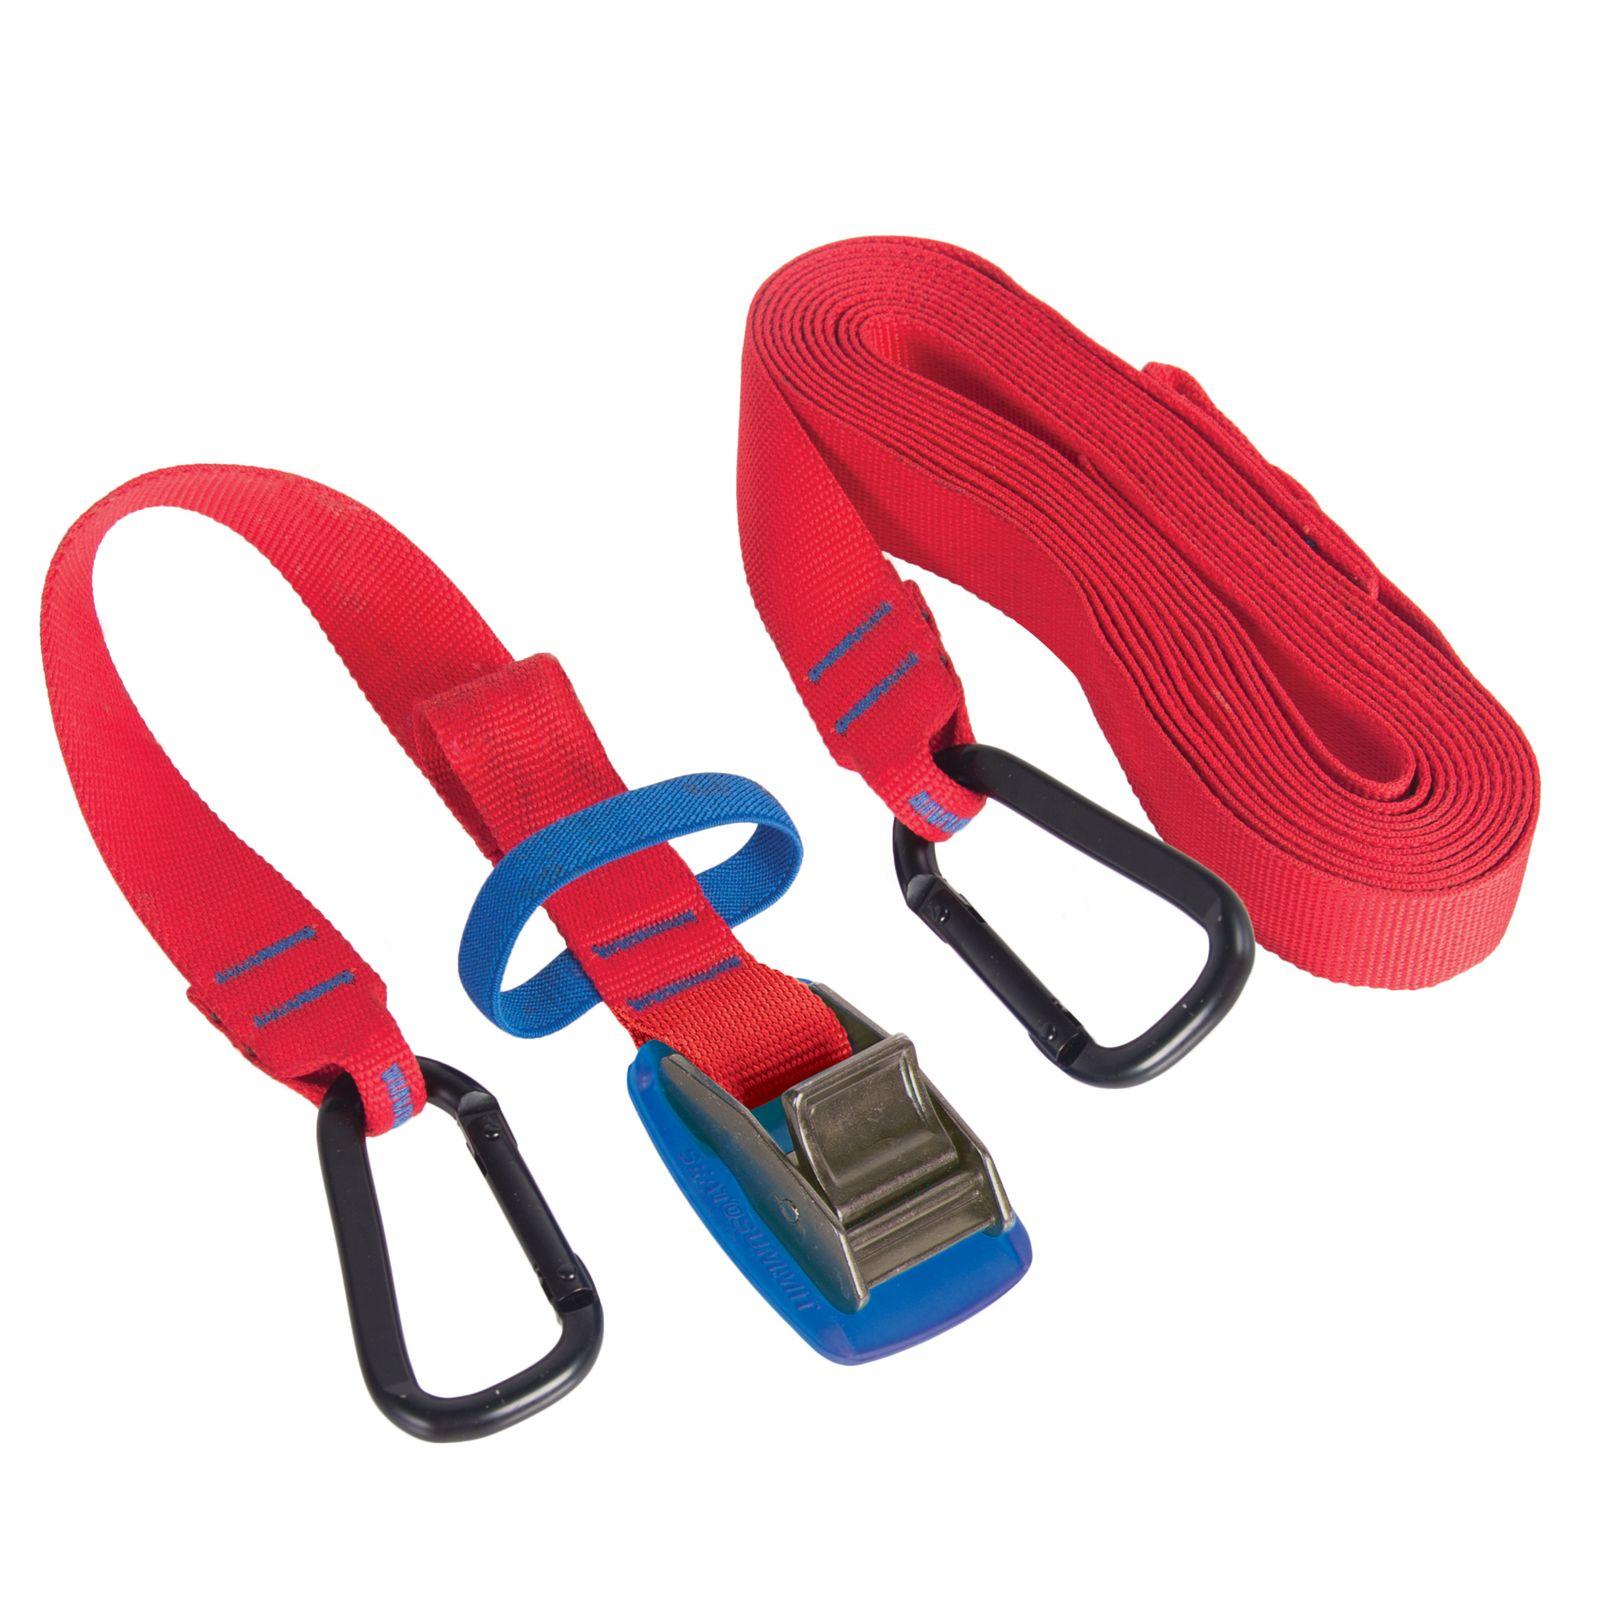 medium resolution of sea to summit l carabiner tie down l car rack accessory l kayak straps